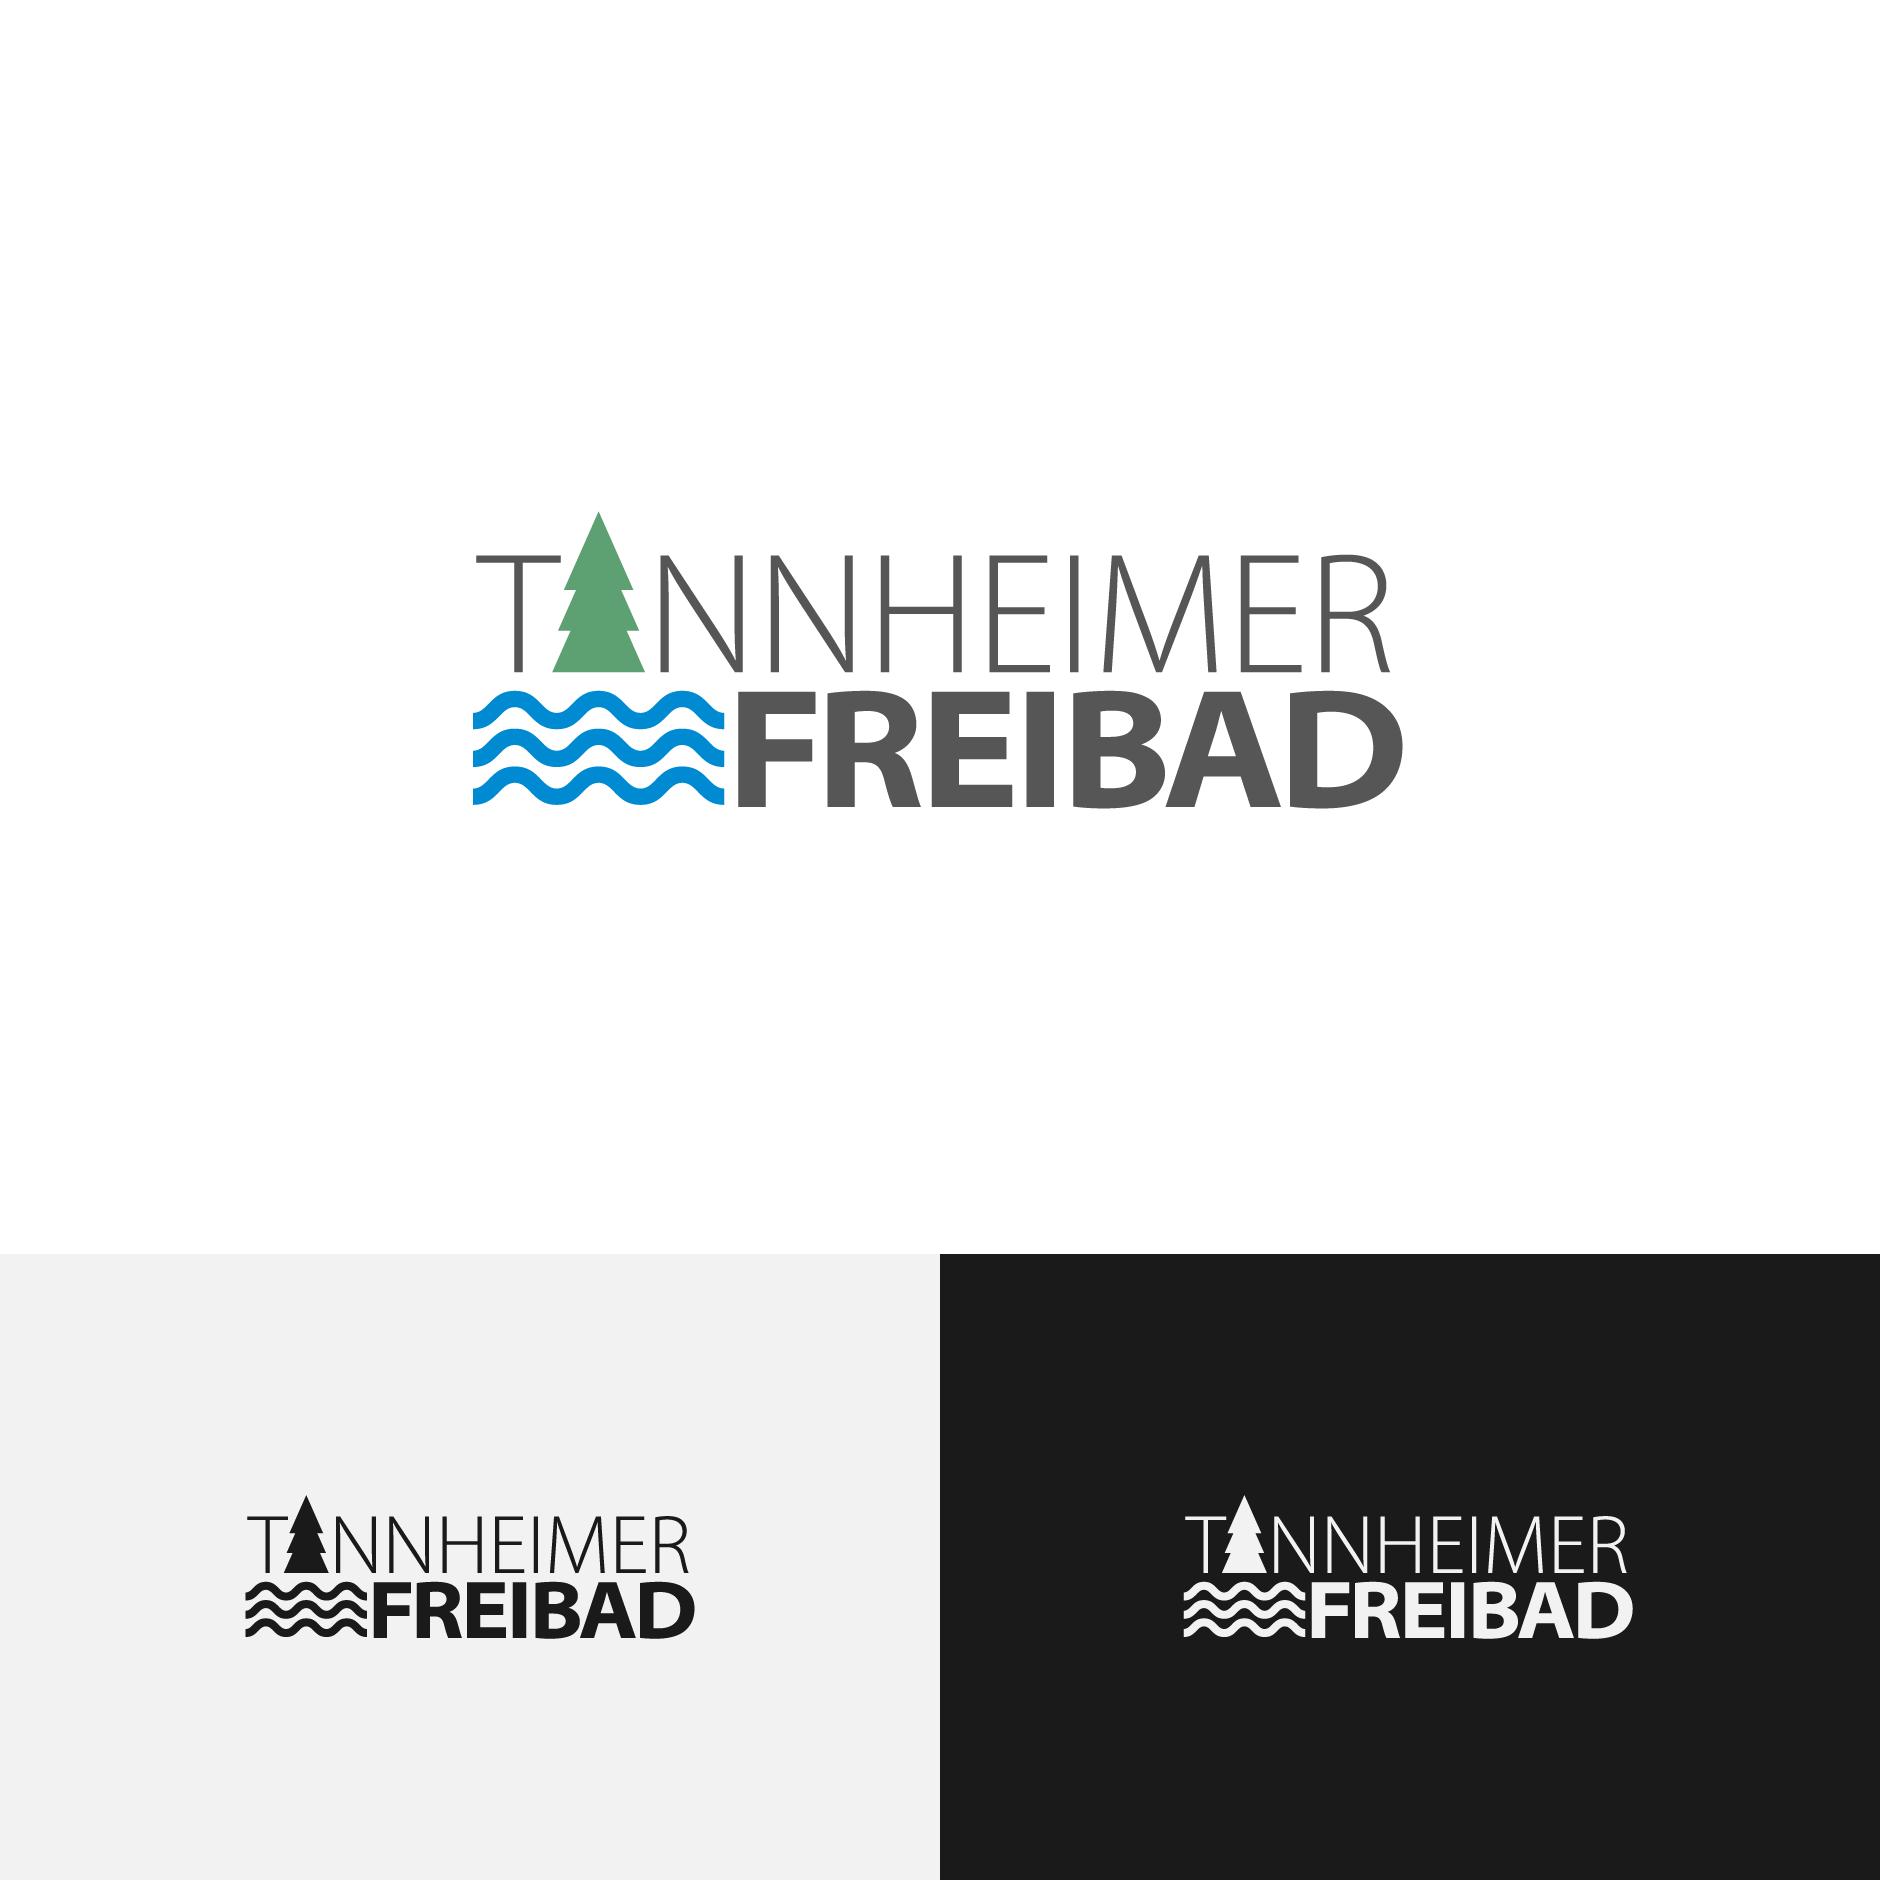 Freibad Tannheim Logo-Logodesign Freibad Tannheim